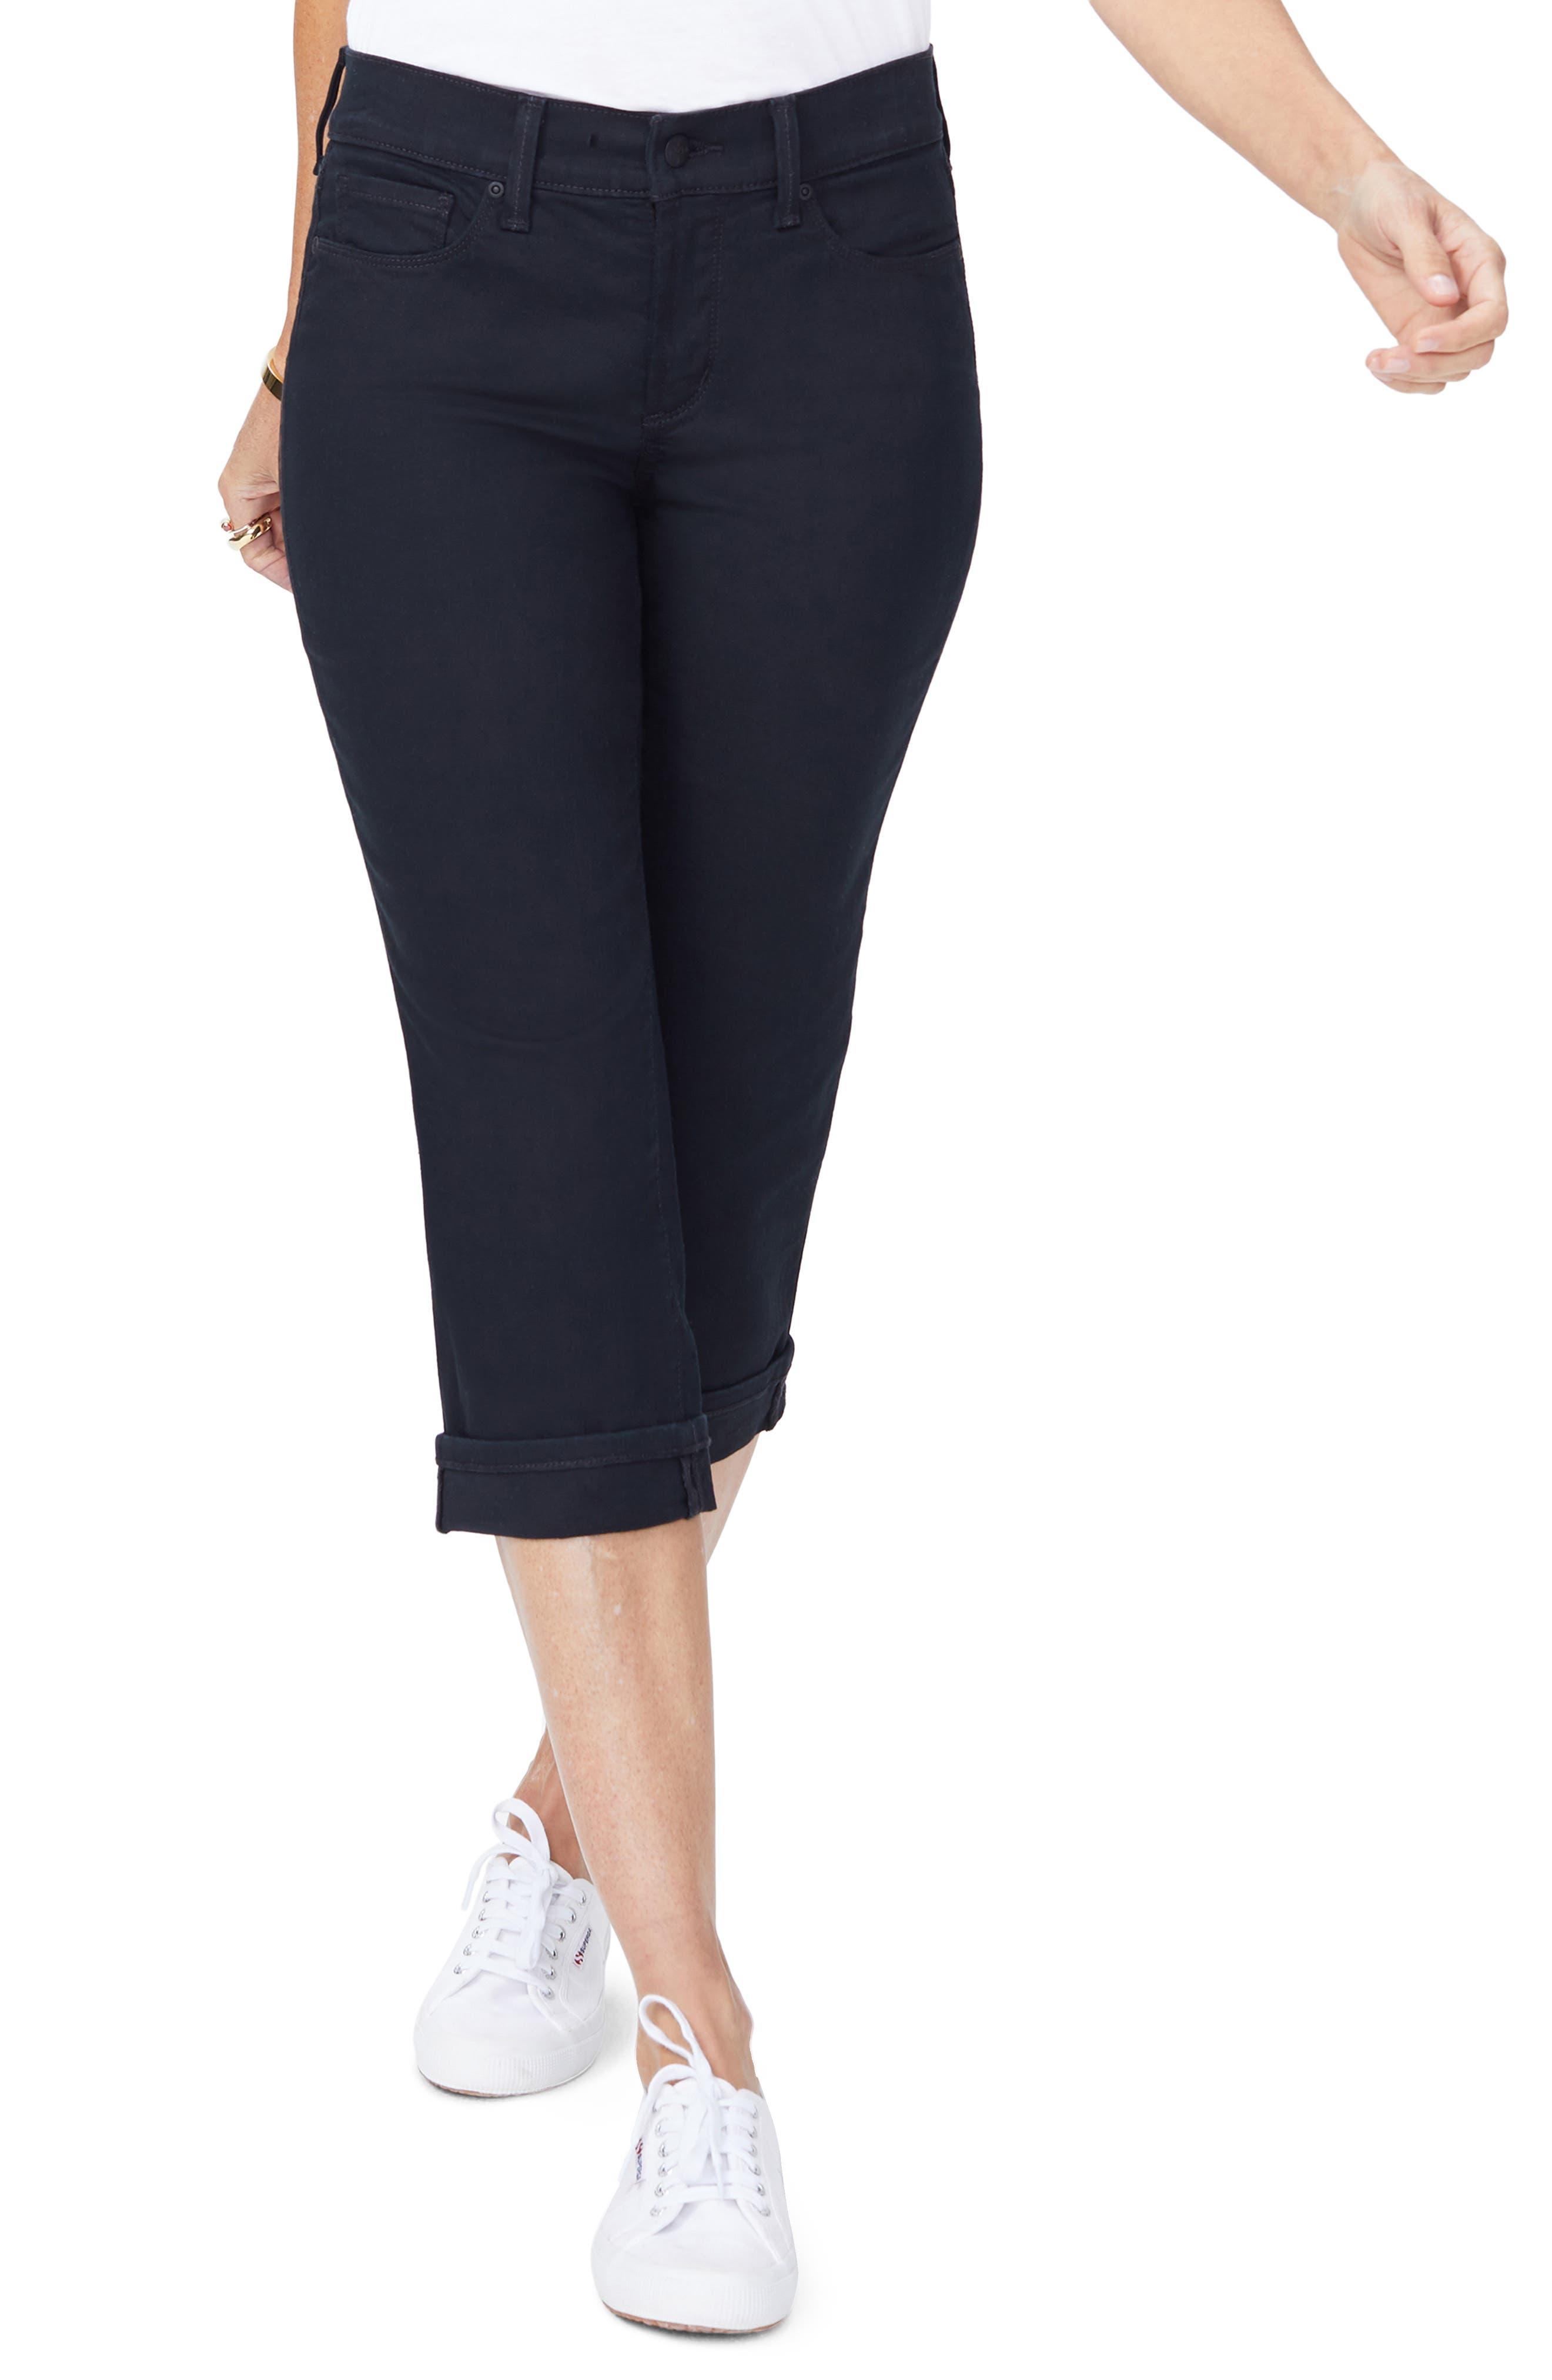 NYDJ Marilyn Crop Jeans, Main, color, BLACK